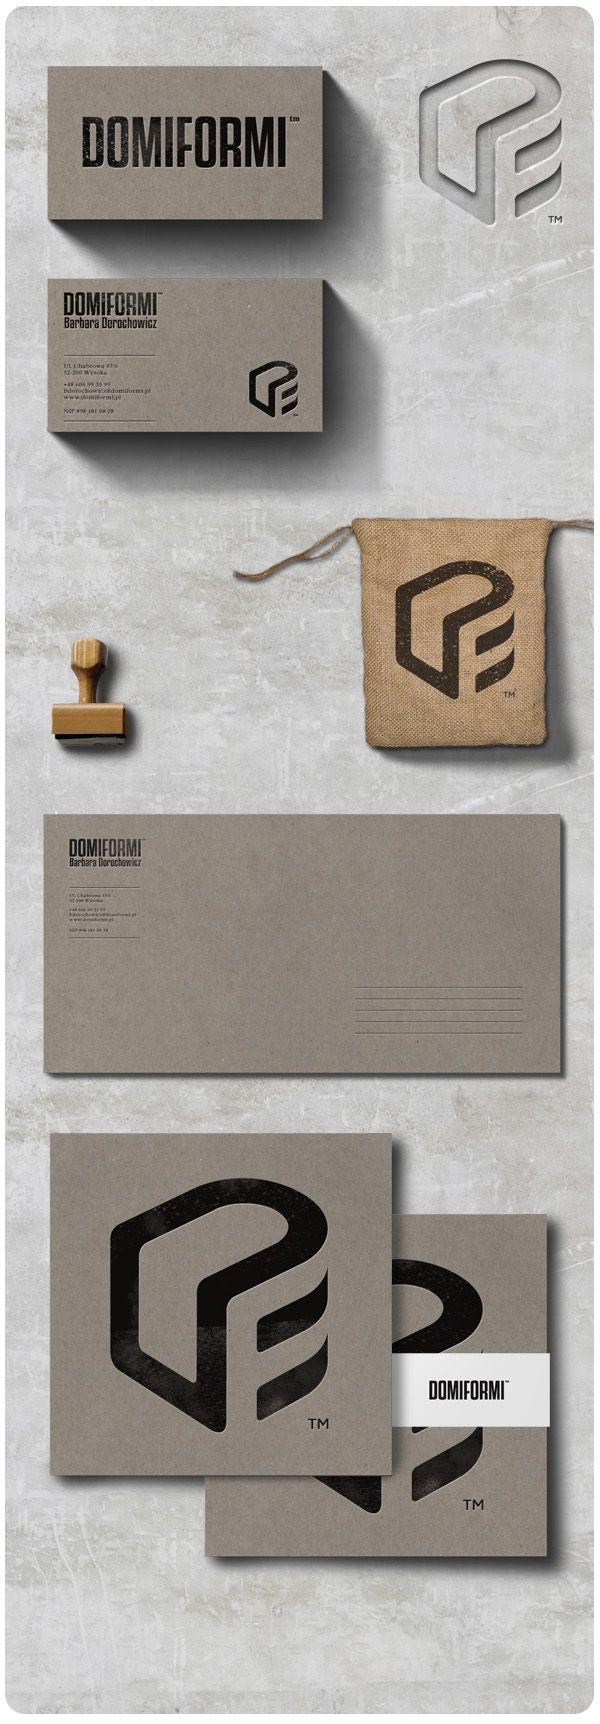 D+F 室內設計LOGO | MyDesy 淘靈感